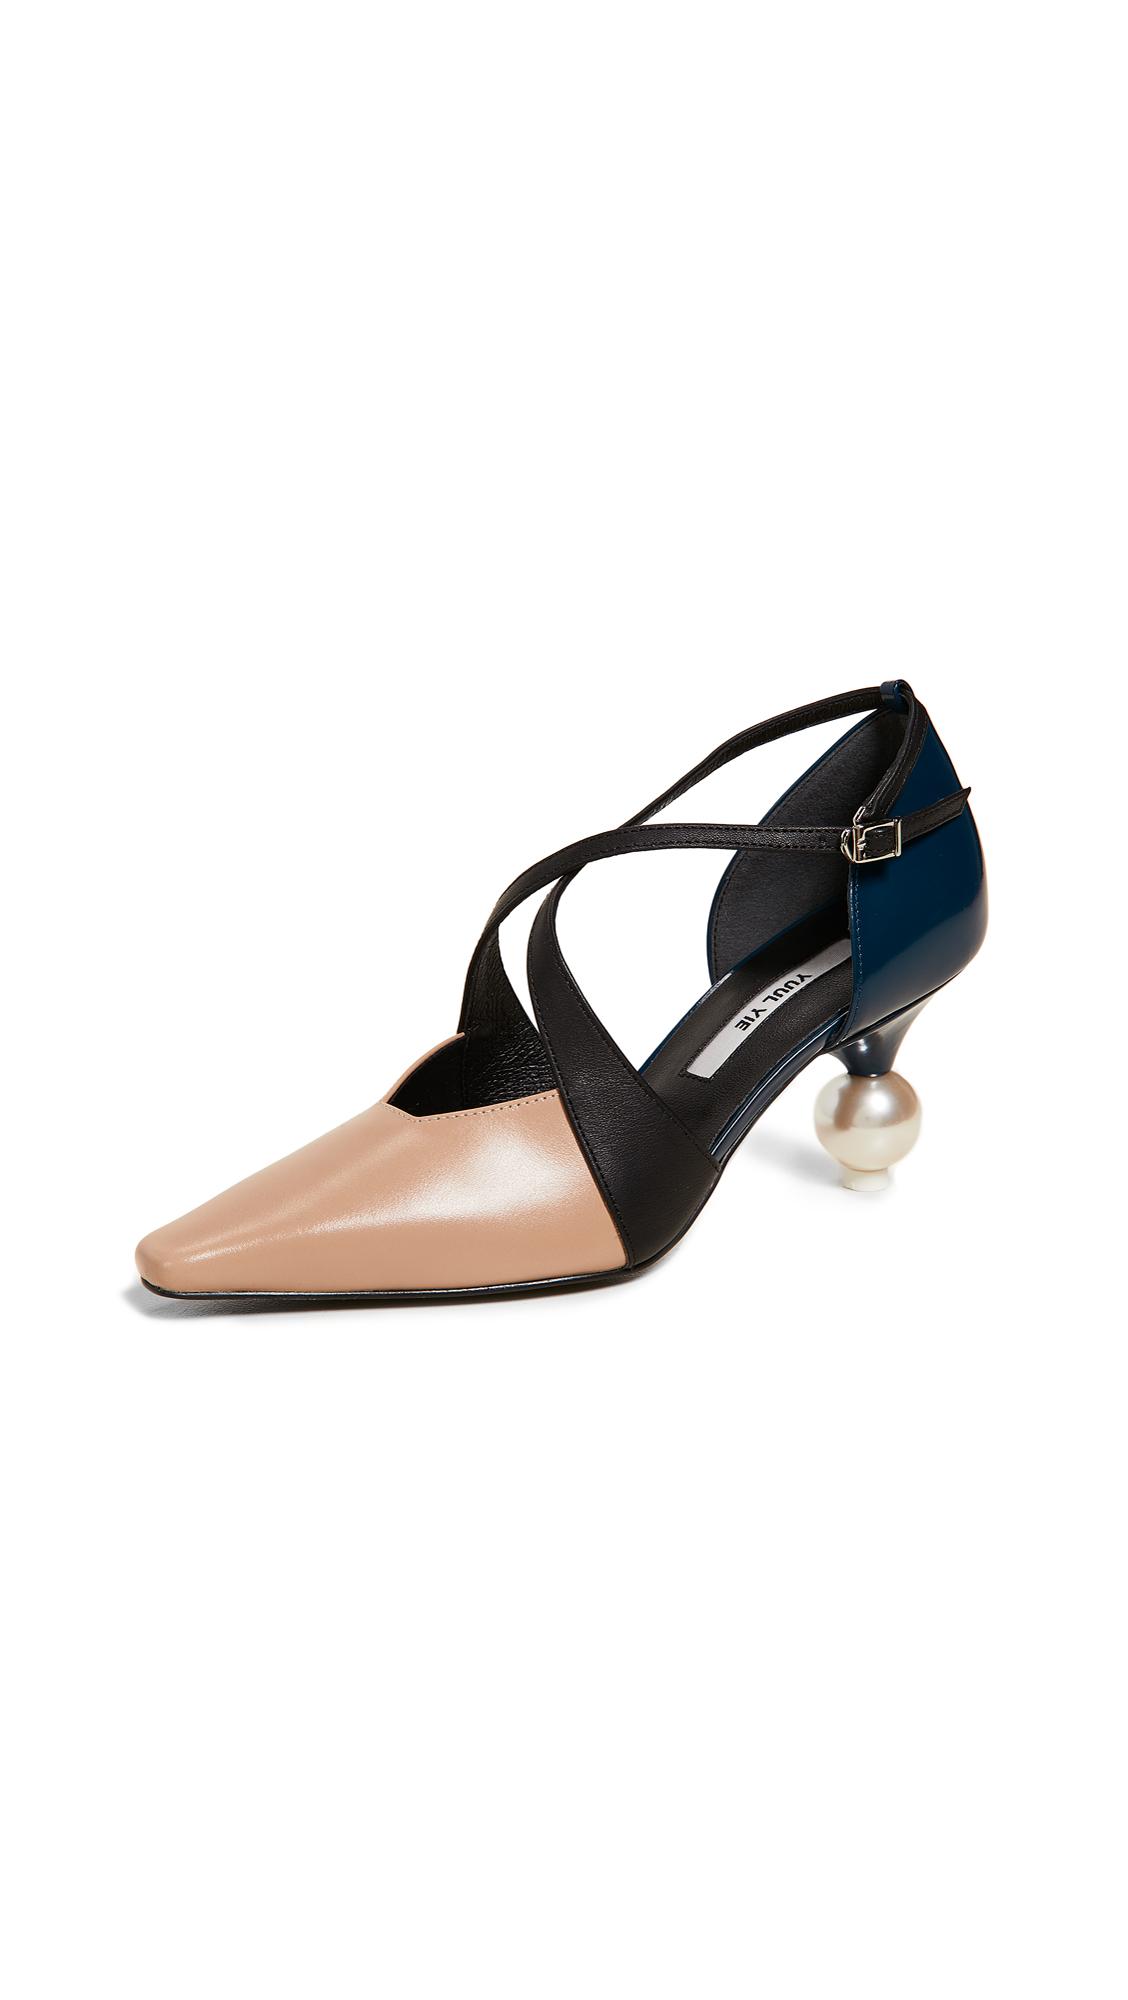 Yuul Yie Ankle Strap Cocktail Heels - Beige/Navy/Black